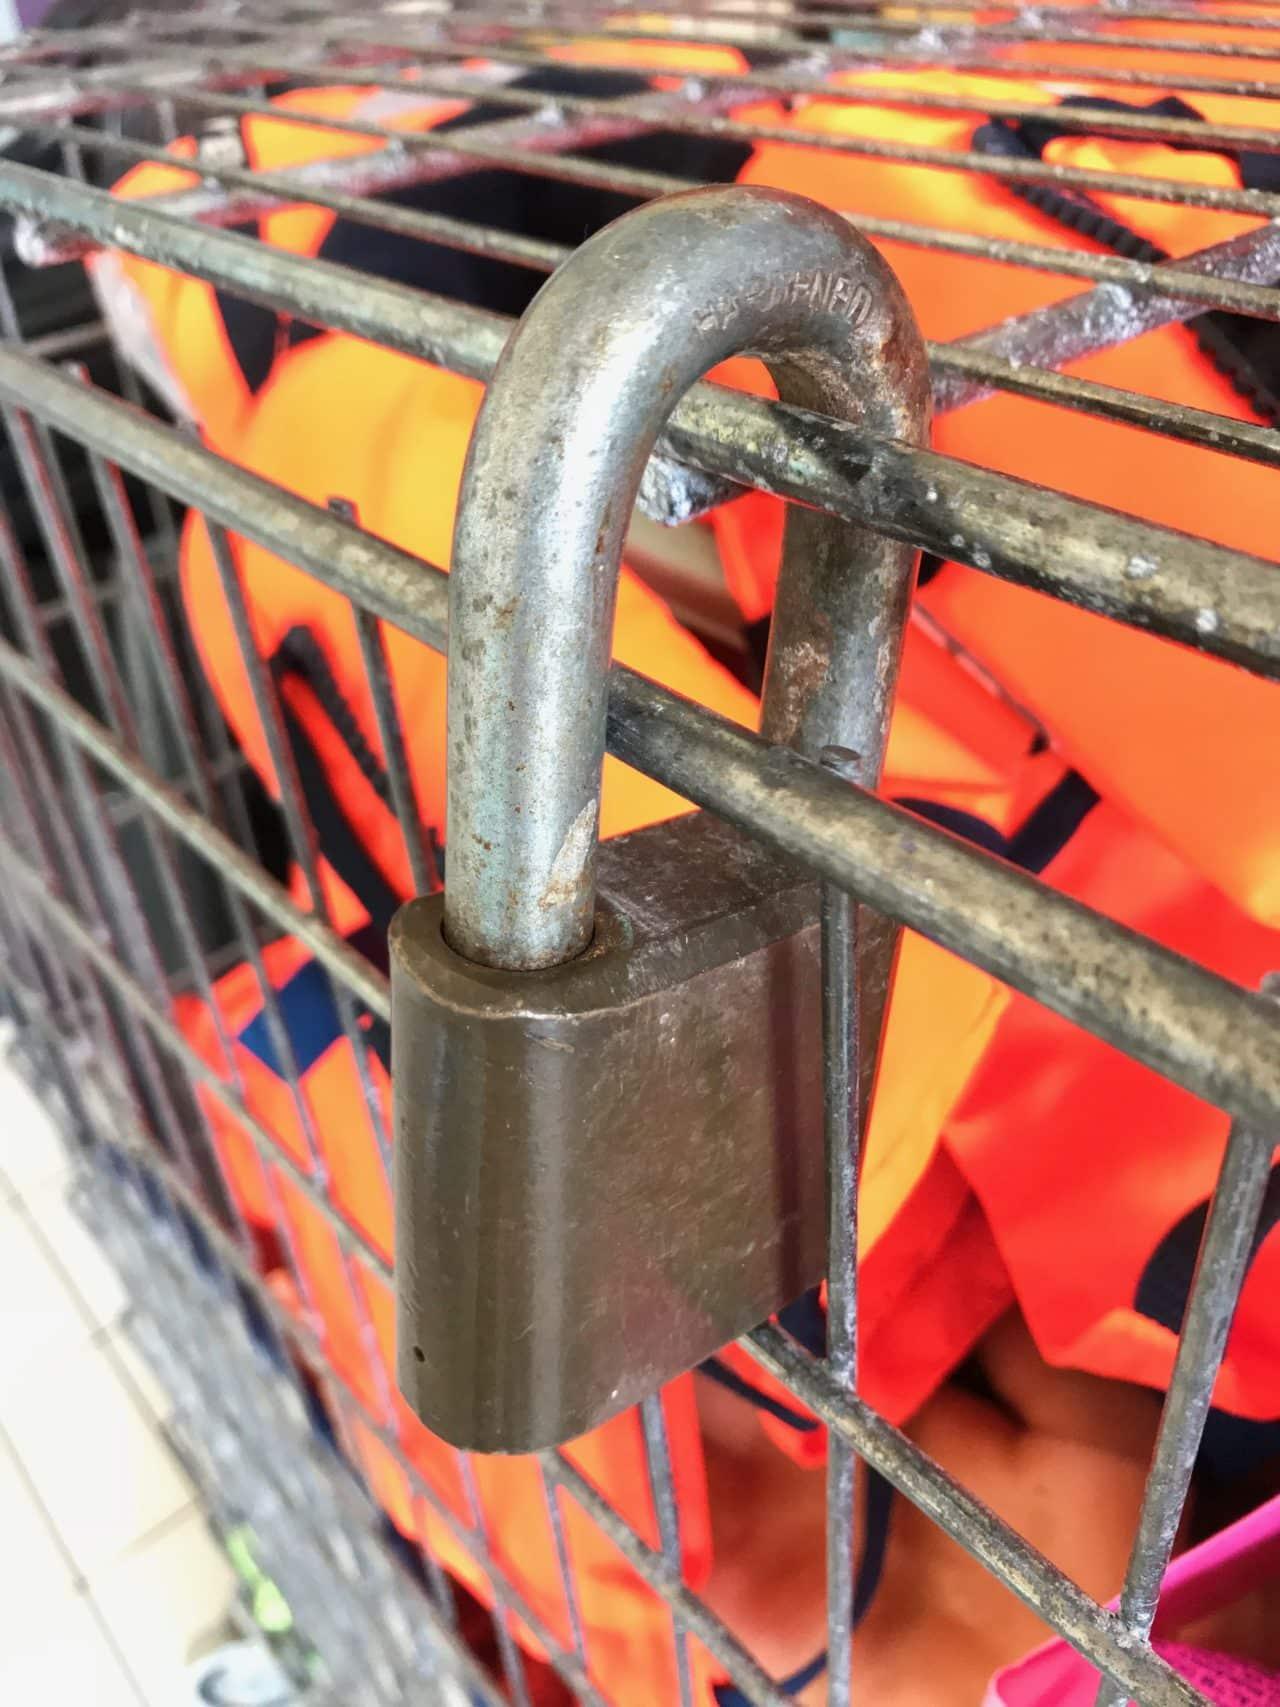 Locked Grating Box Keeping Lifevests Secure